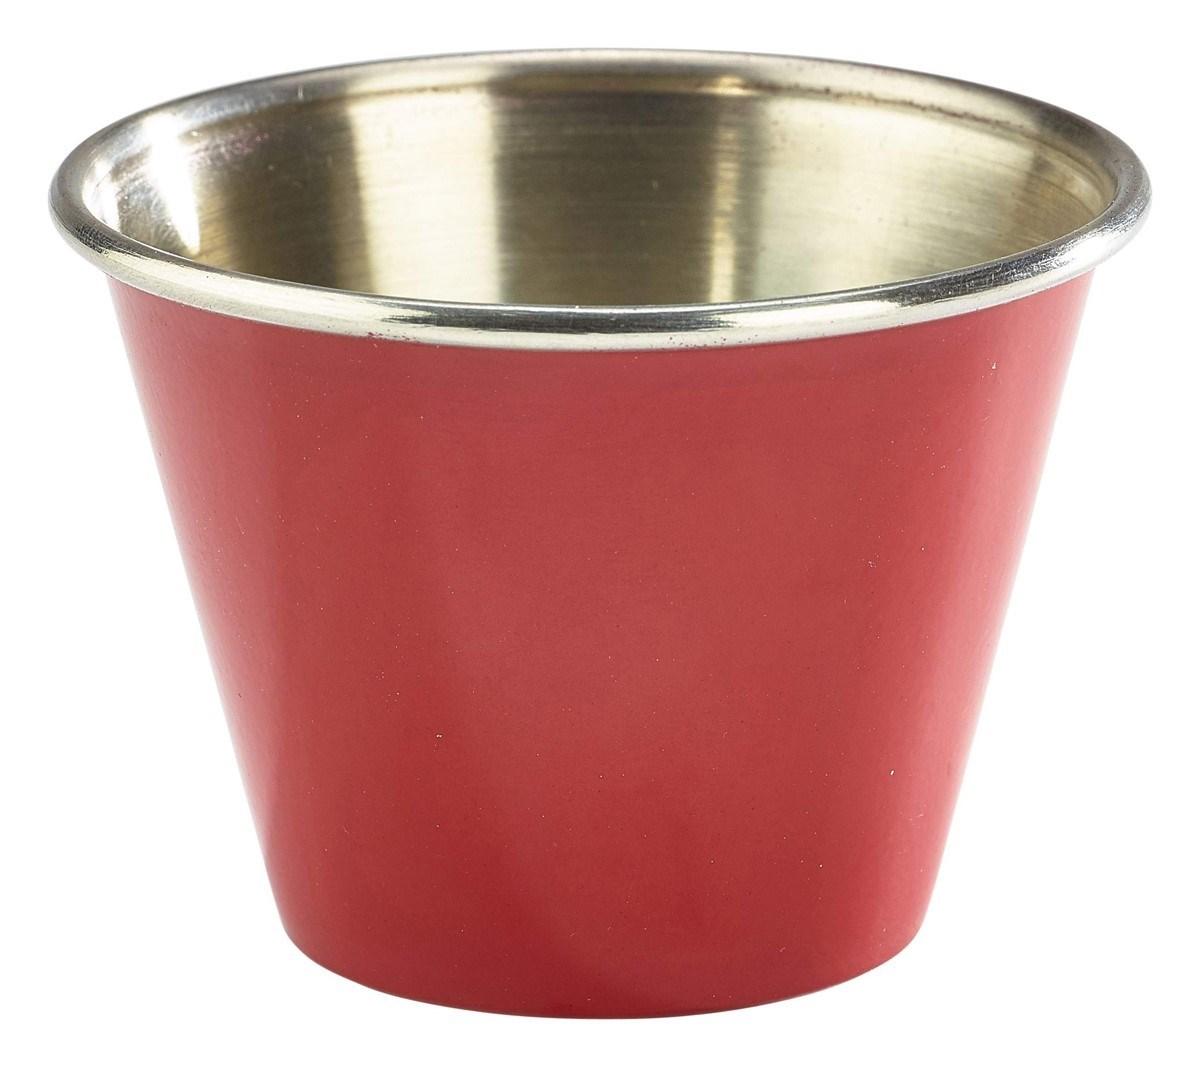 Productafbeelding RVS ramekin glad rood 71 ml